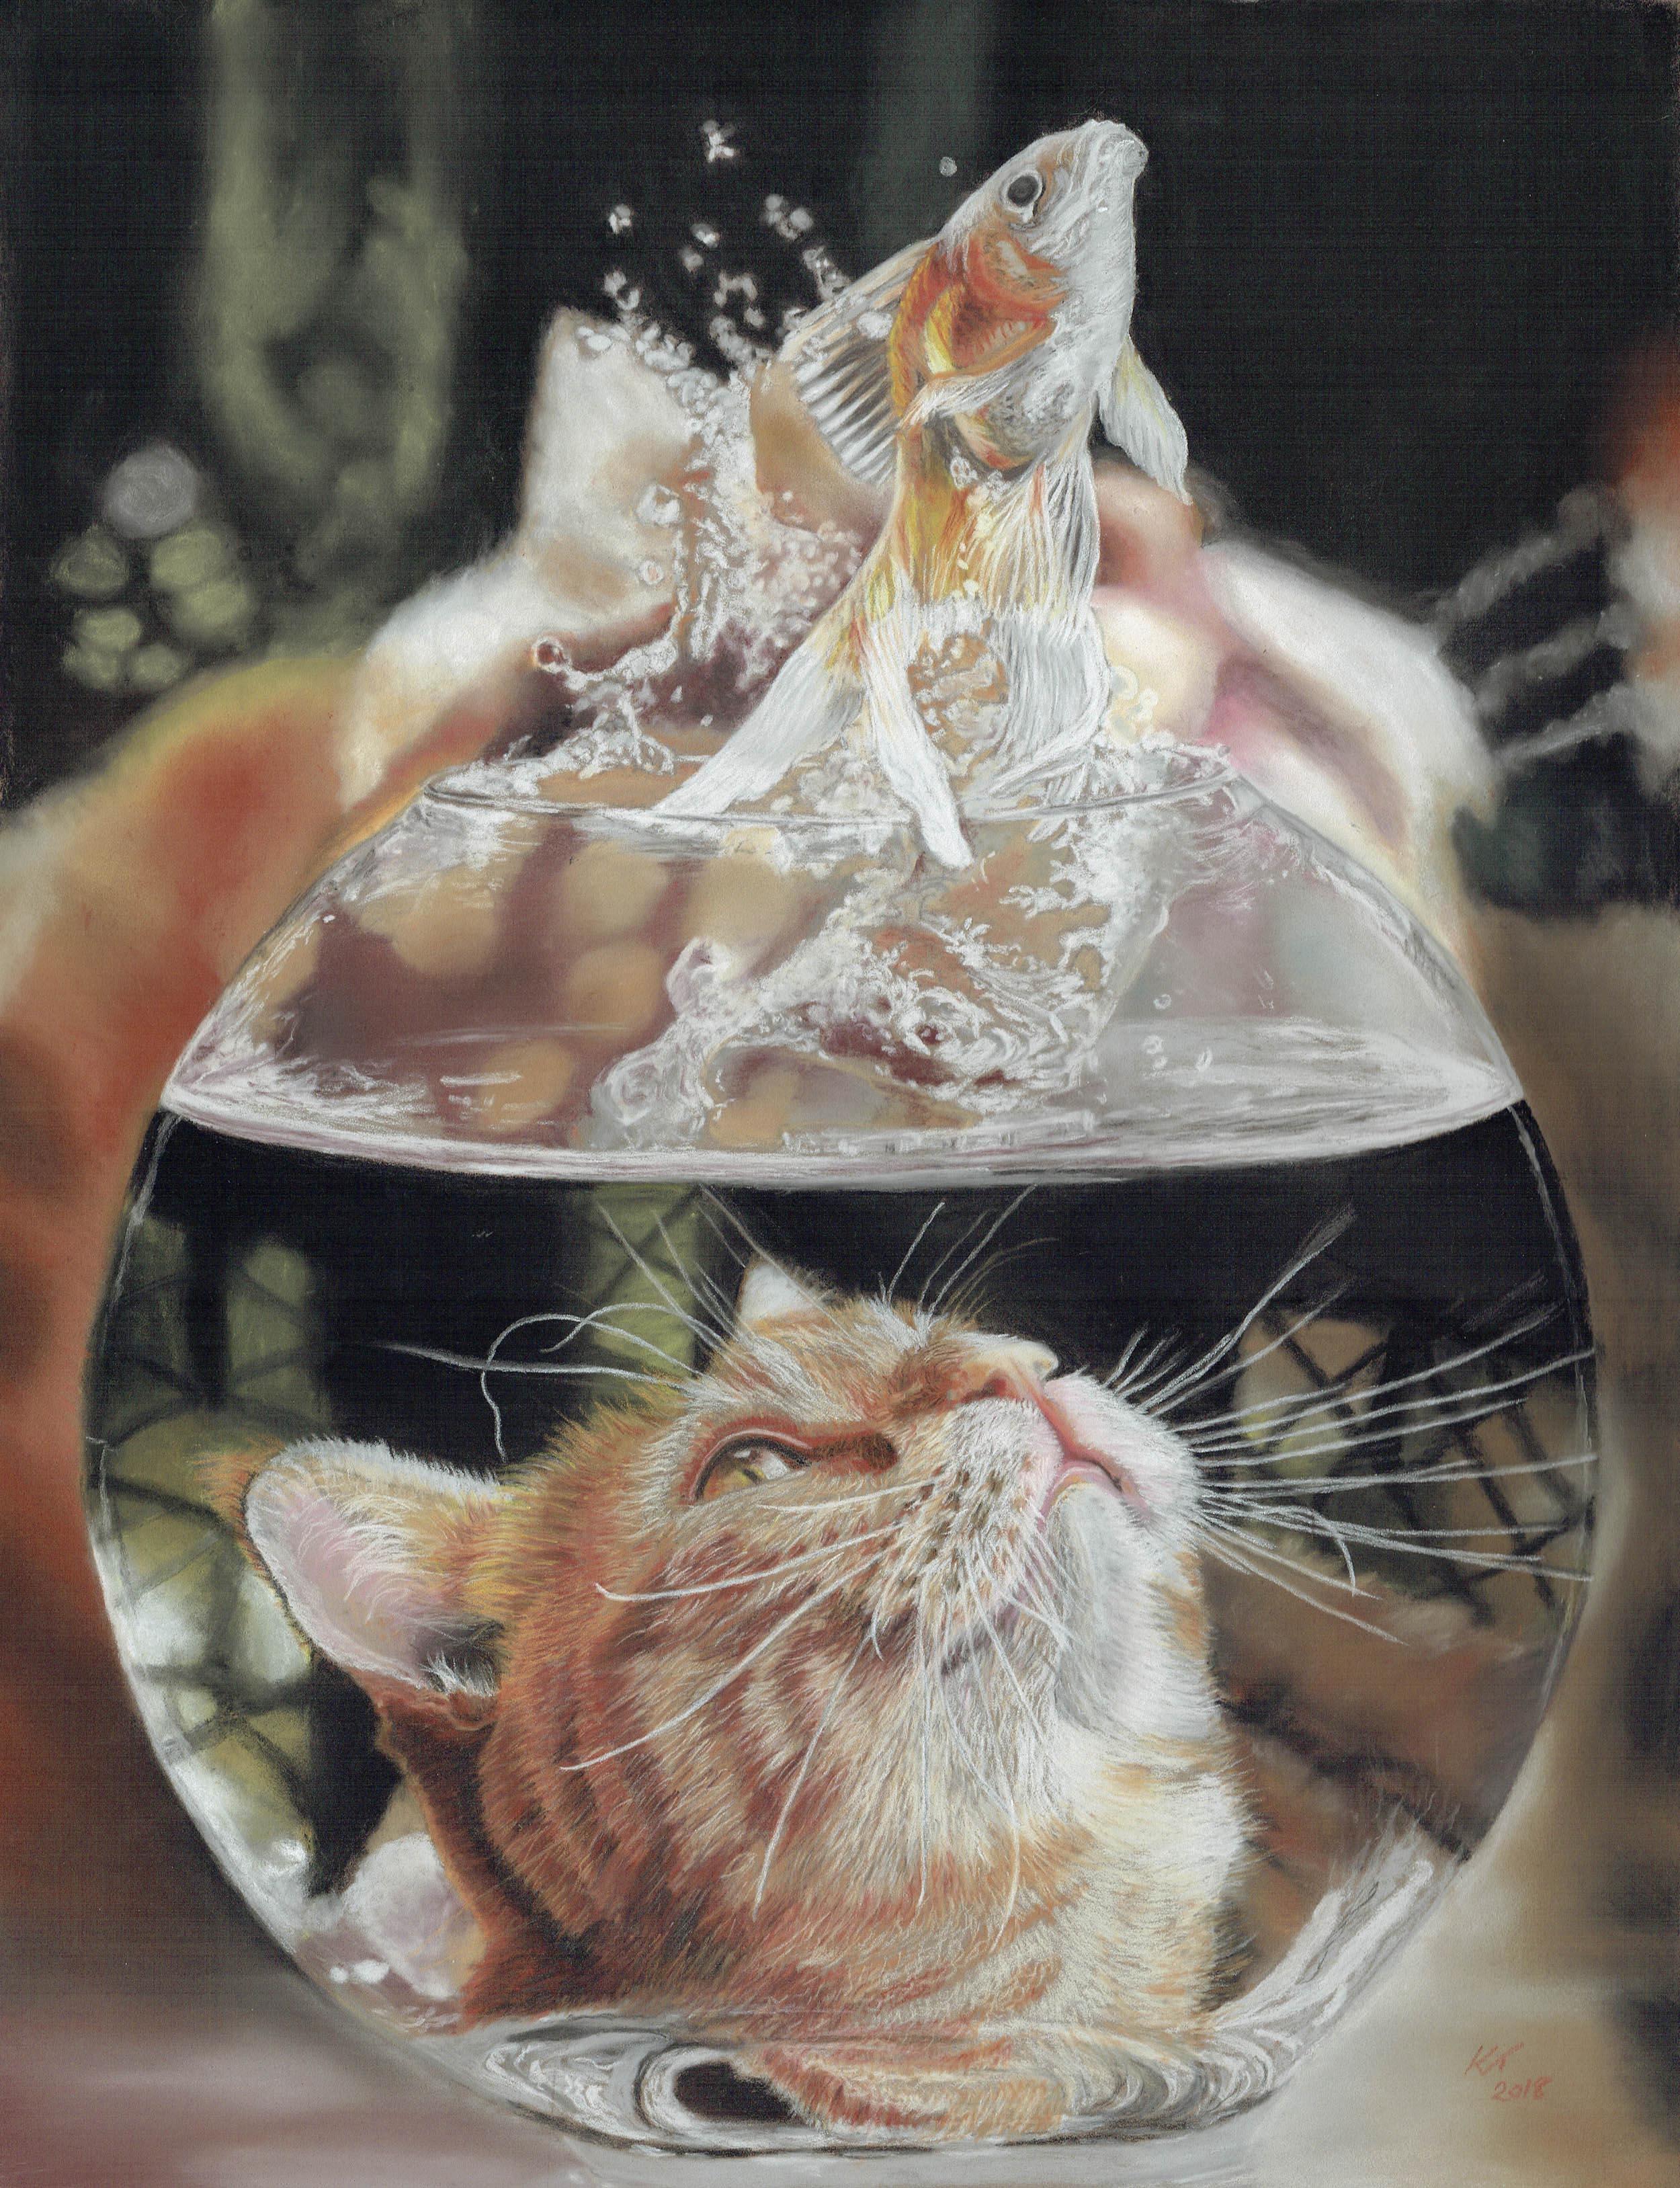 Kaz Turner, Rise to the Bait, Pastel on pastelmat, 38 x 48 cm unframed 56 x 66 x 2.5 cm framed,  http://kazturner.com/index.html